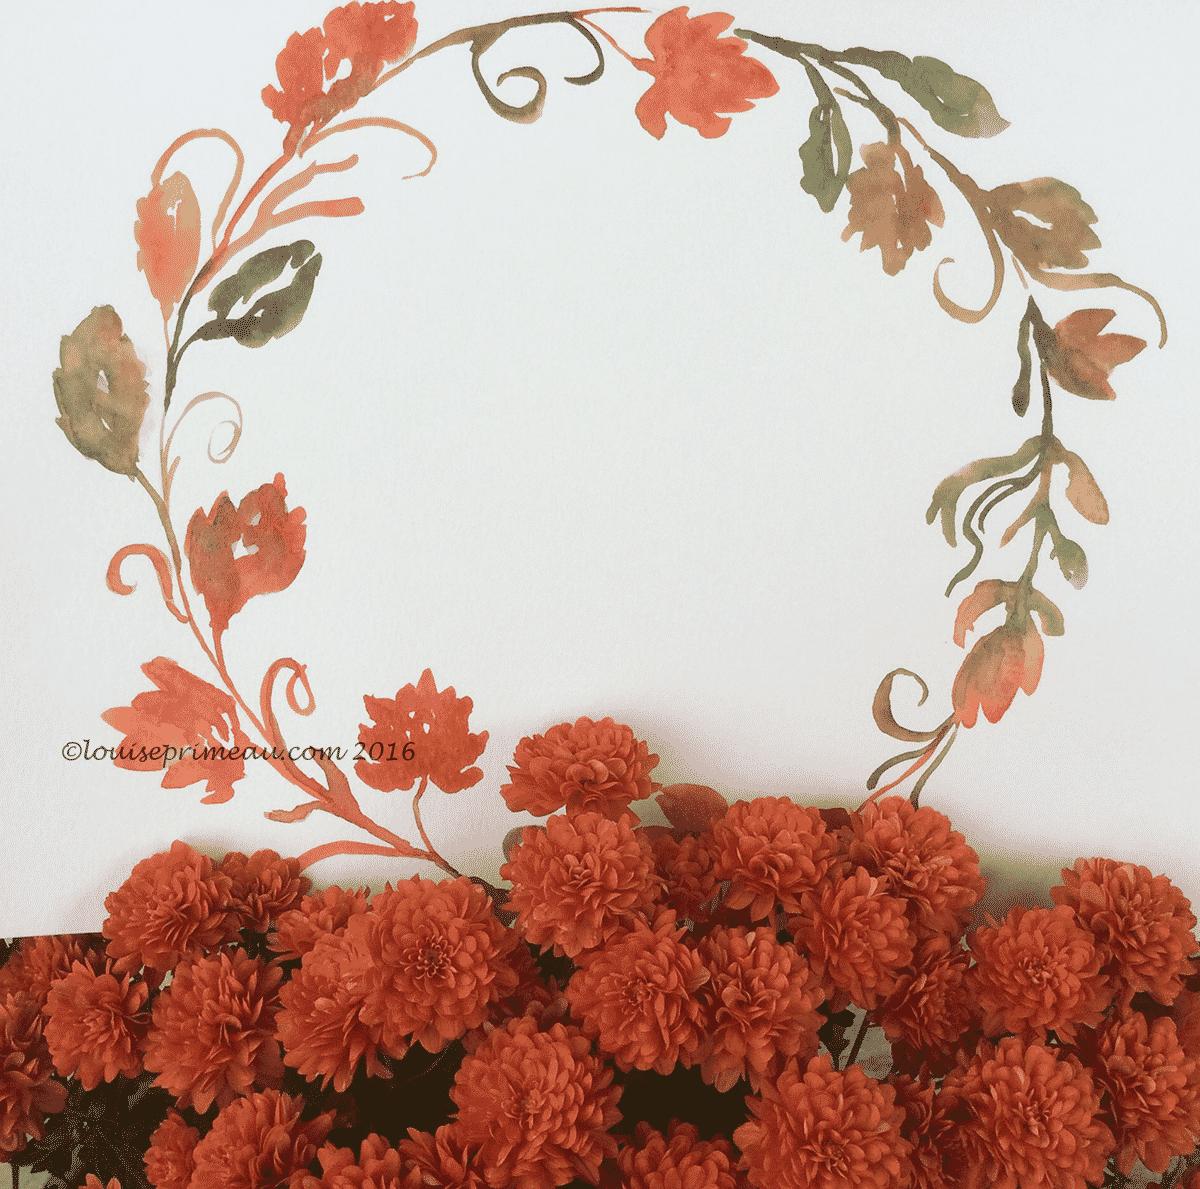 watercolour wreath for fall